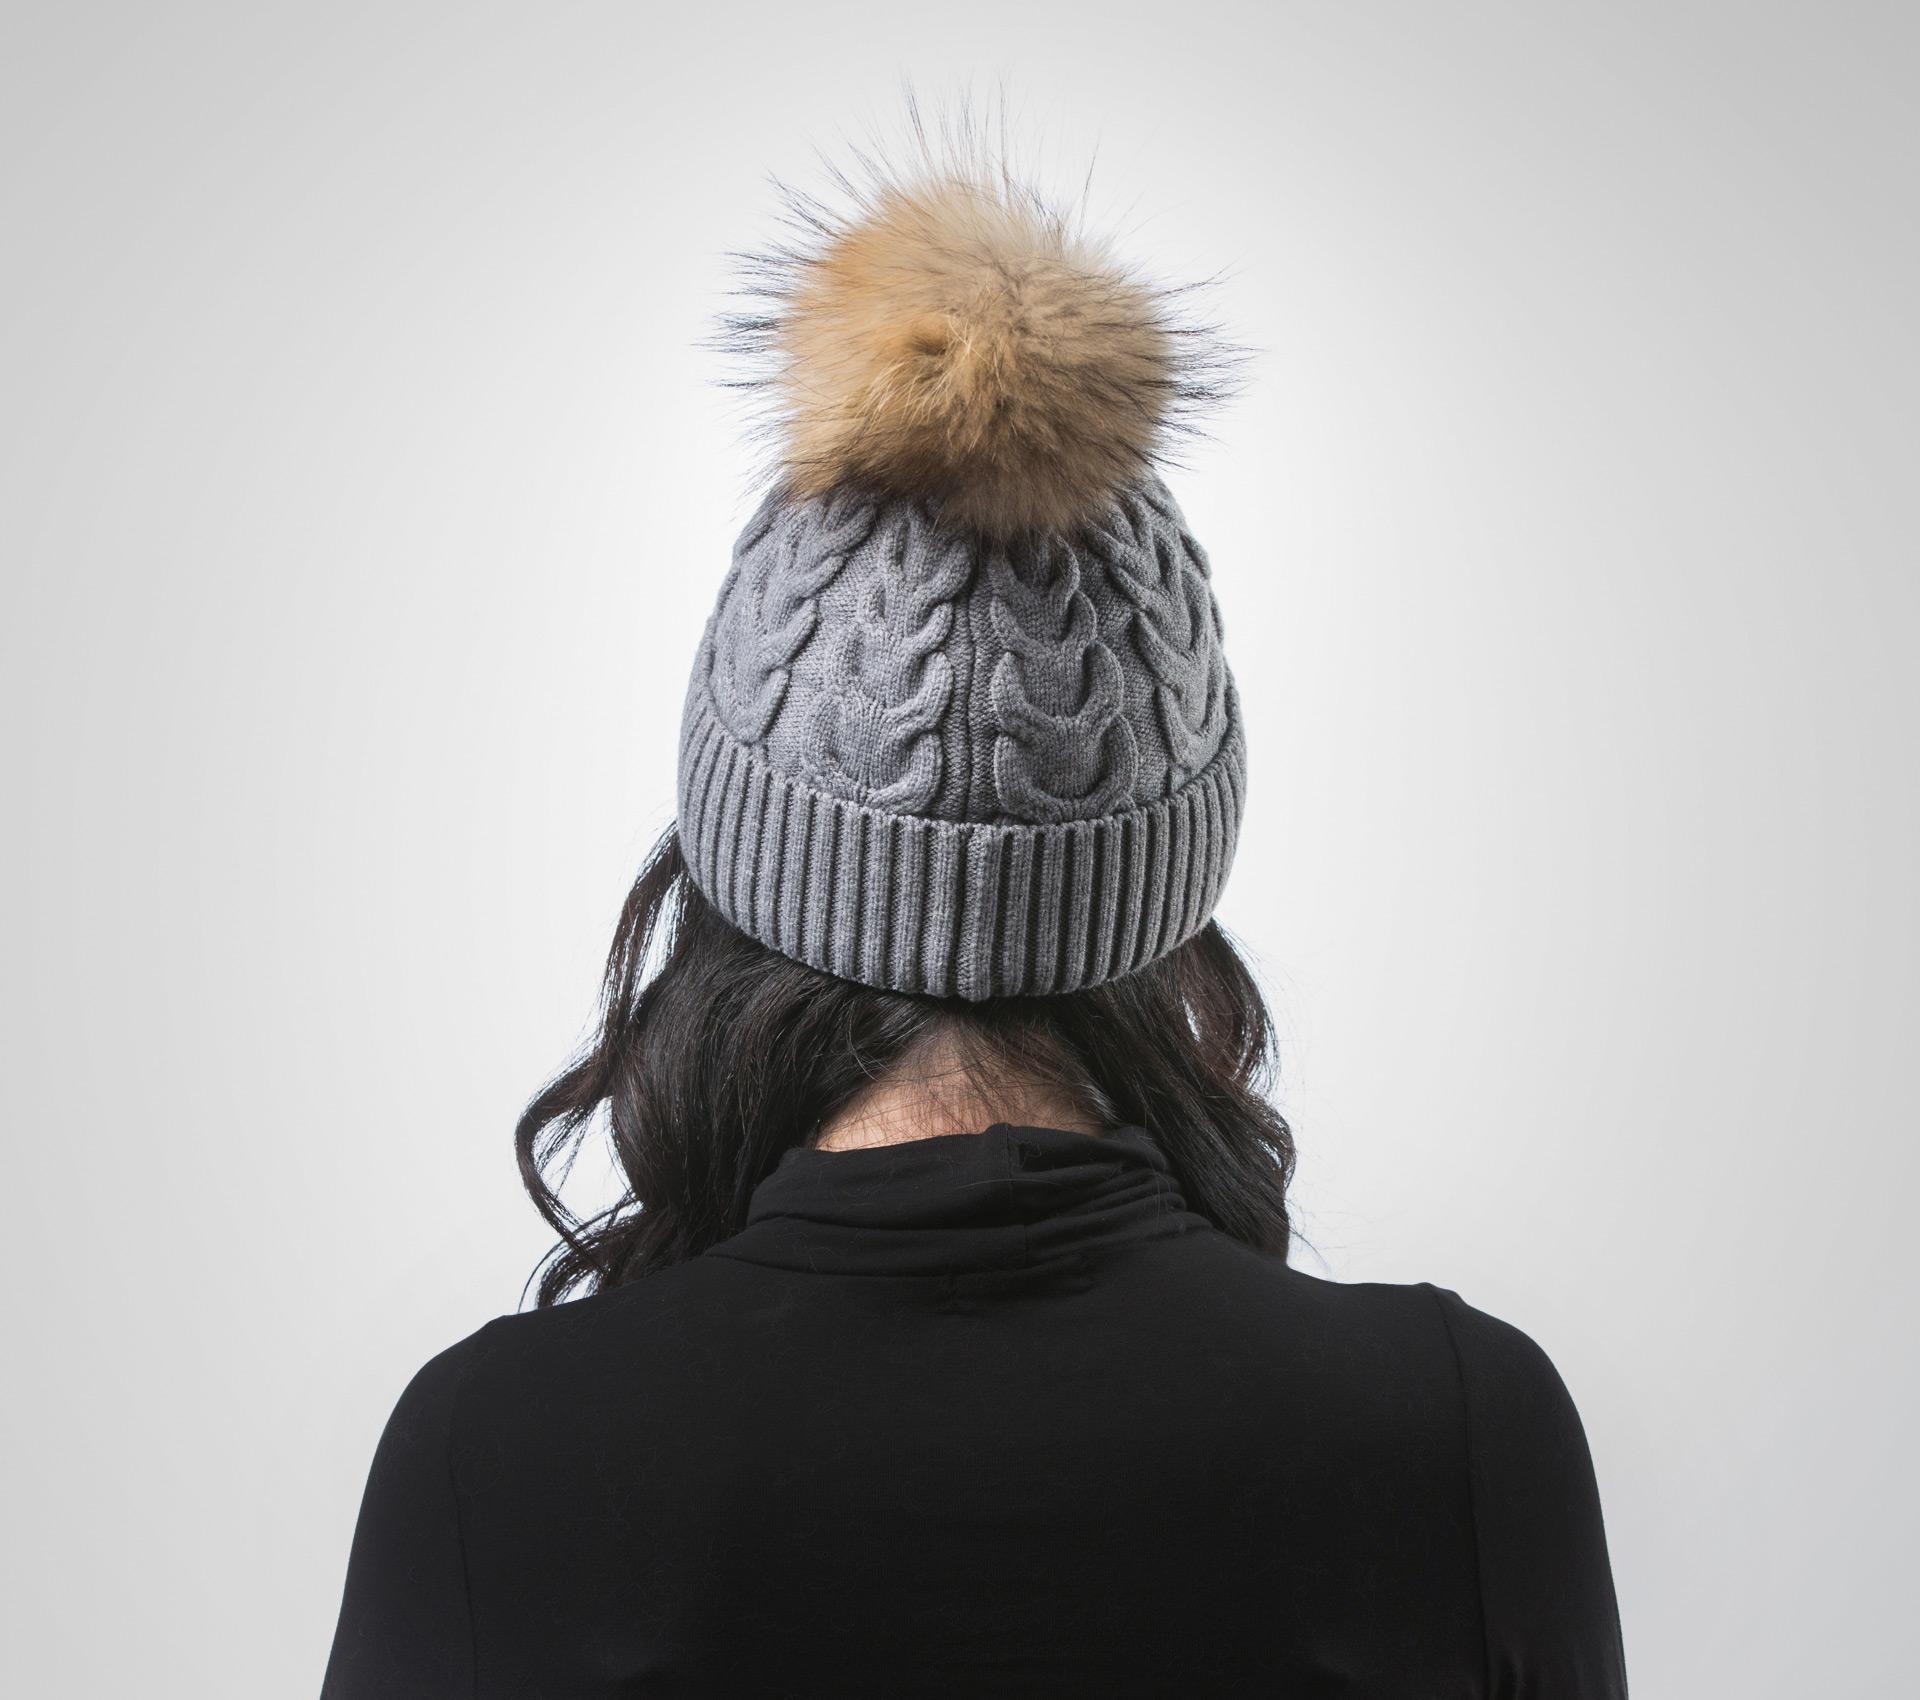 8167cfbe840 Gray Beanie With Raccoon Pom Pom . 100% Real Fur Hats- Haute Acorn